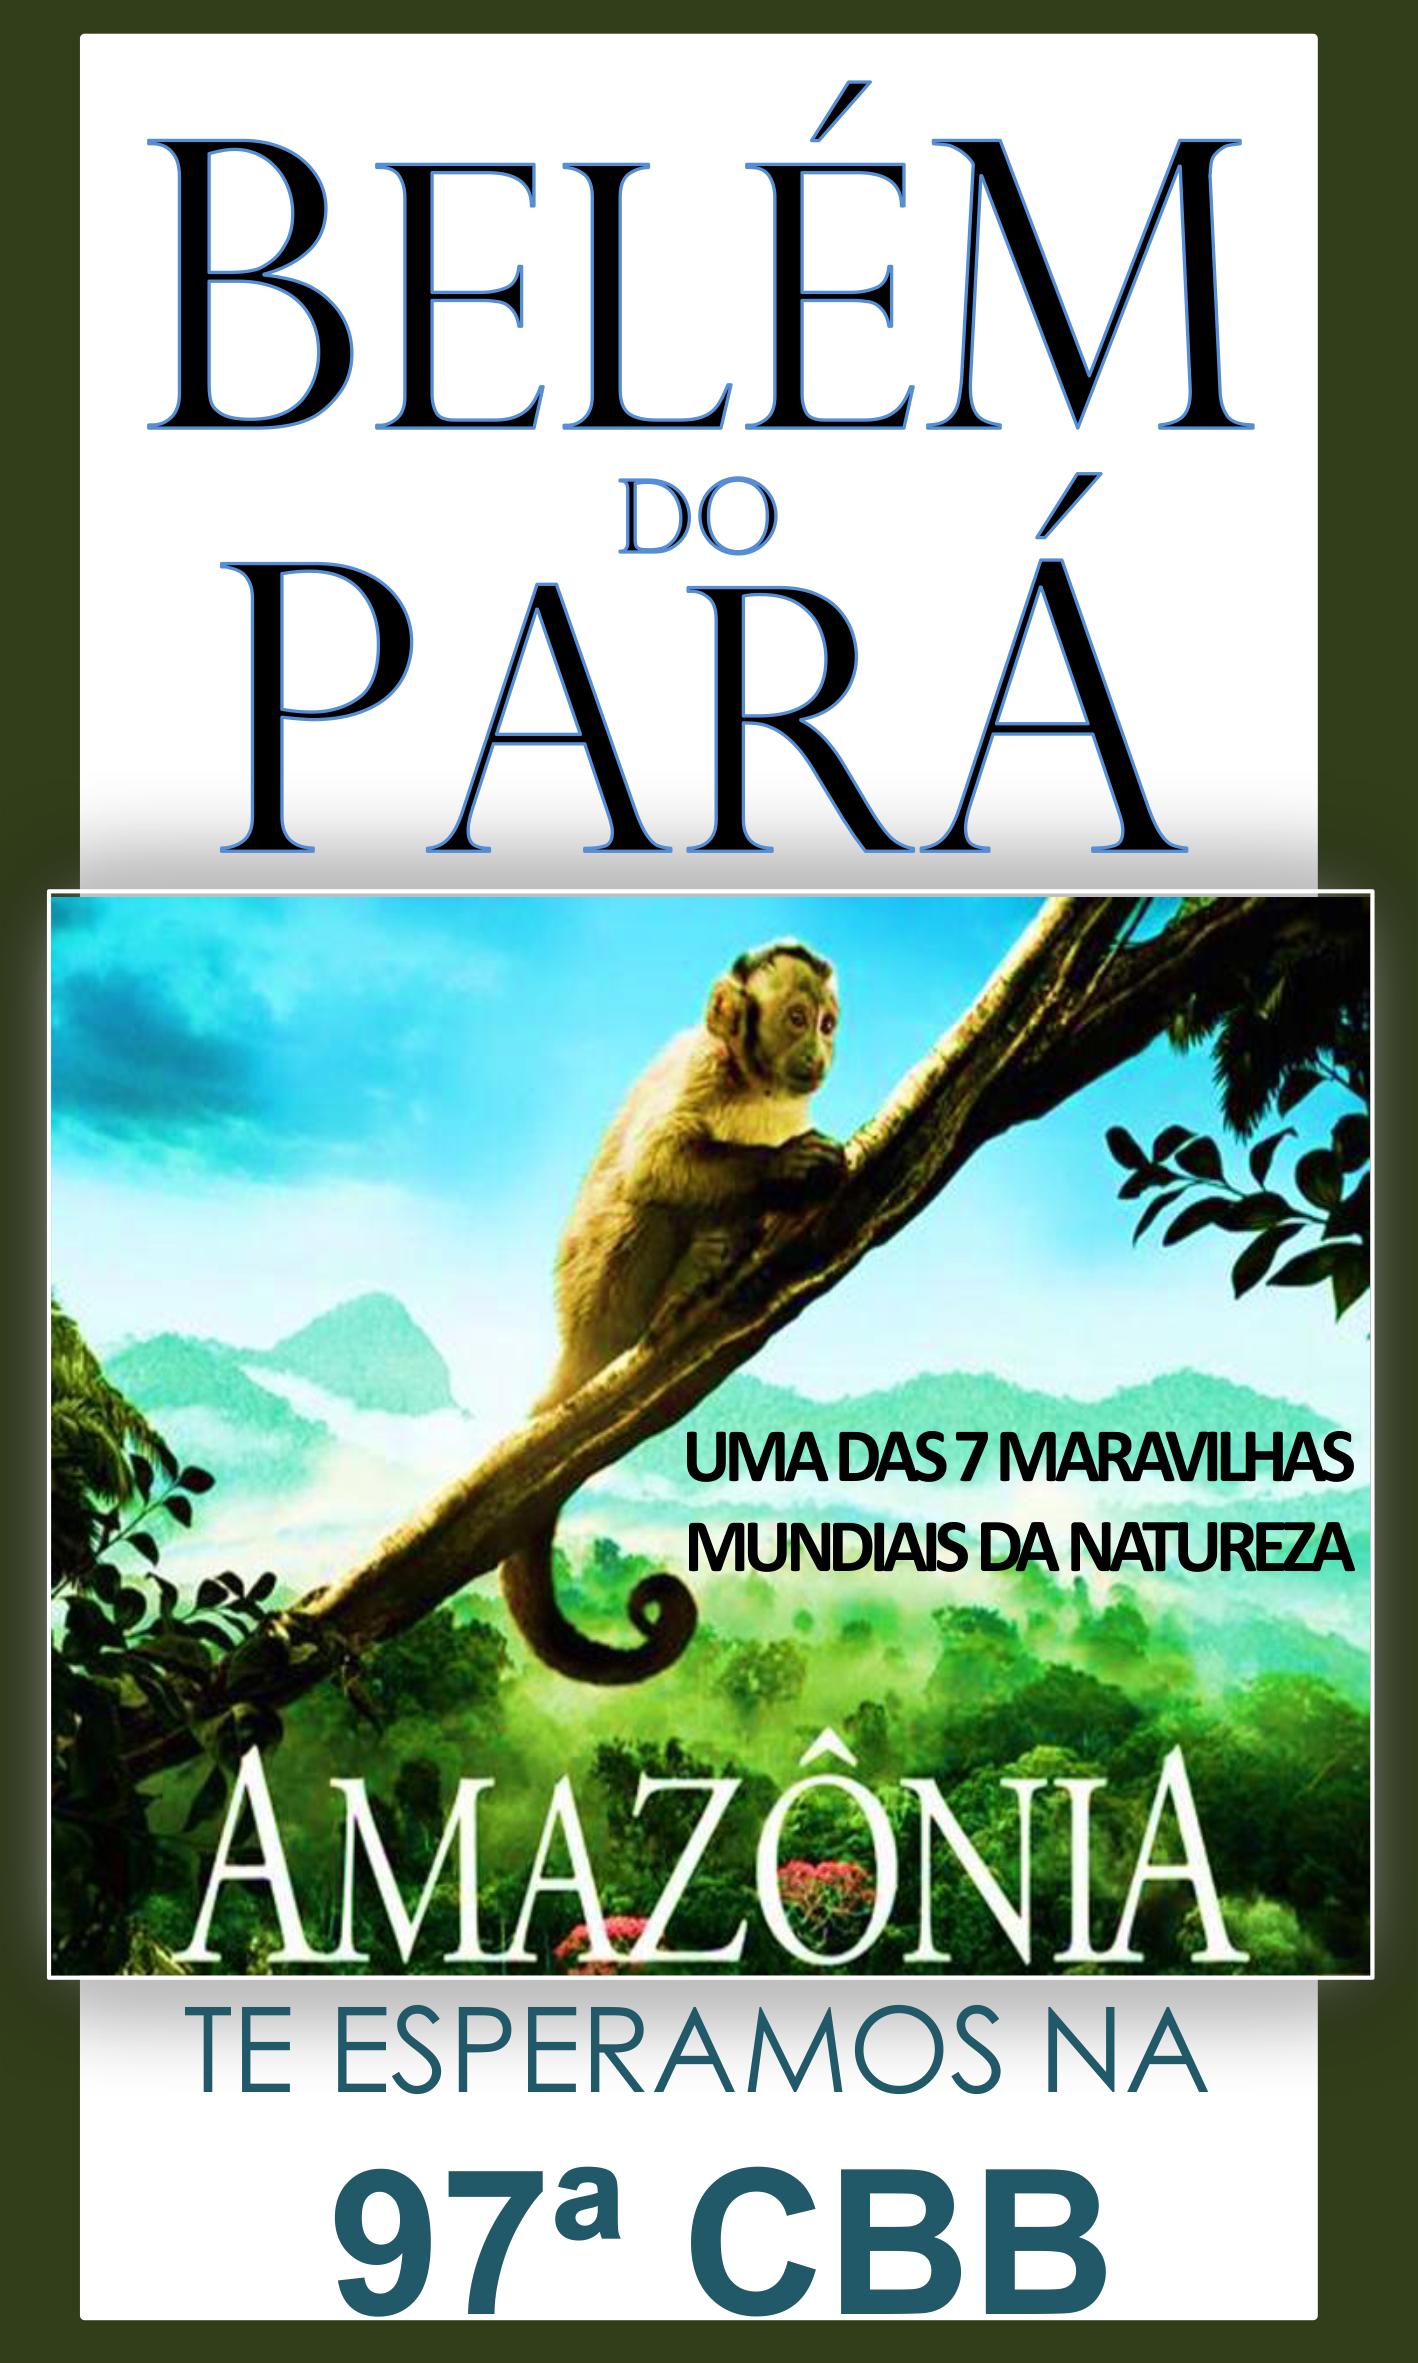 cbb_amazonia_2017